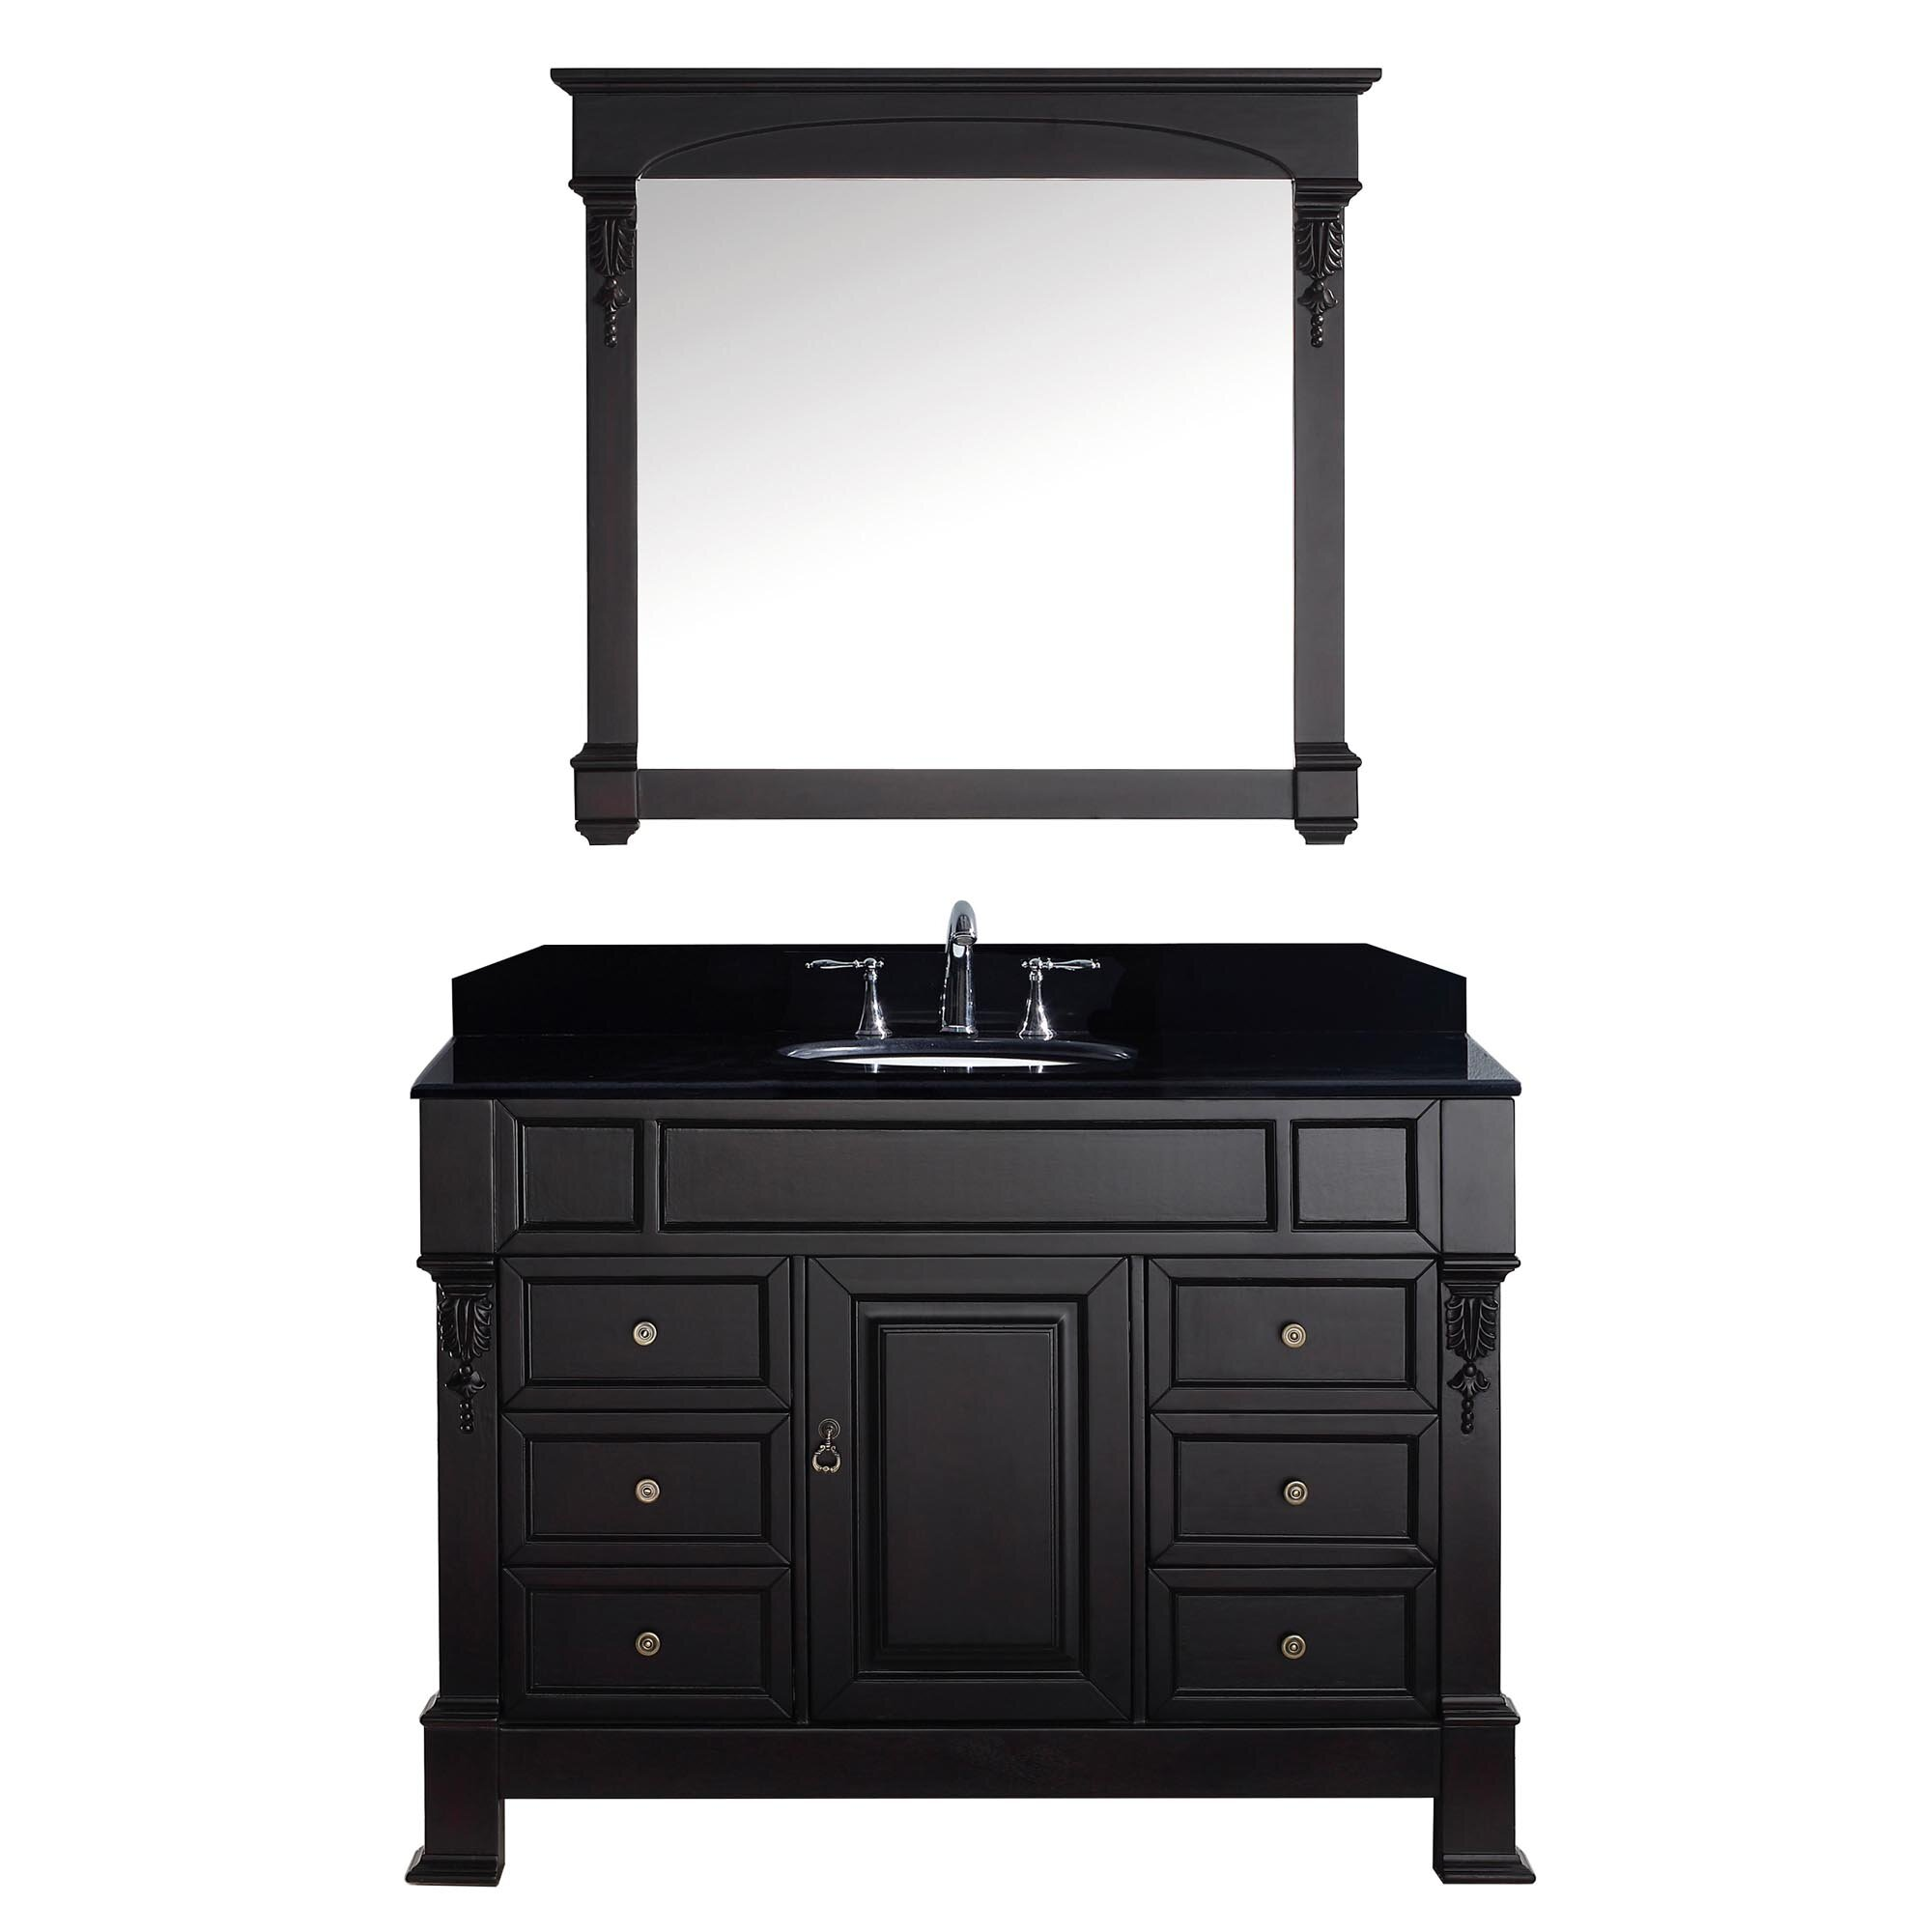 virtu victoria 47 3 single bathroom vanity set with black galaxy top and mirror wayfair